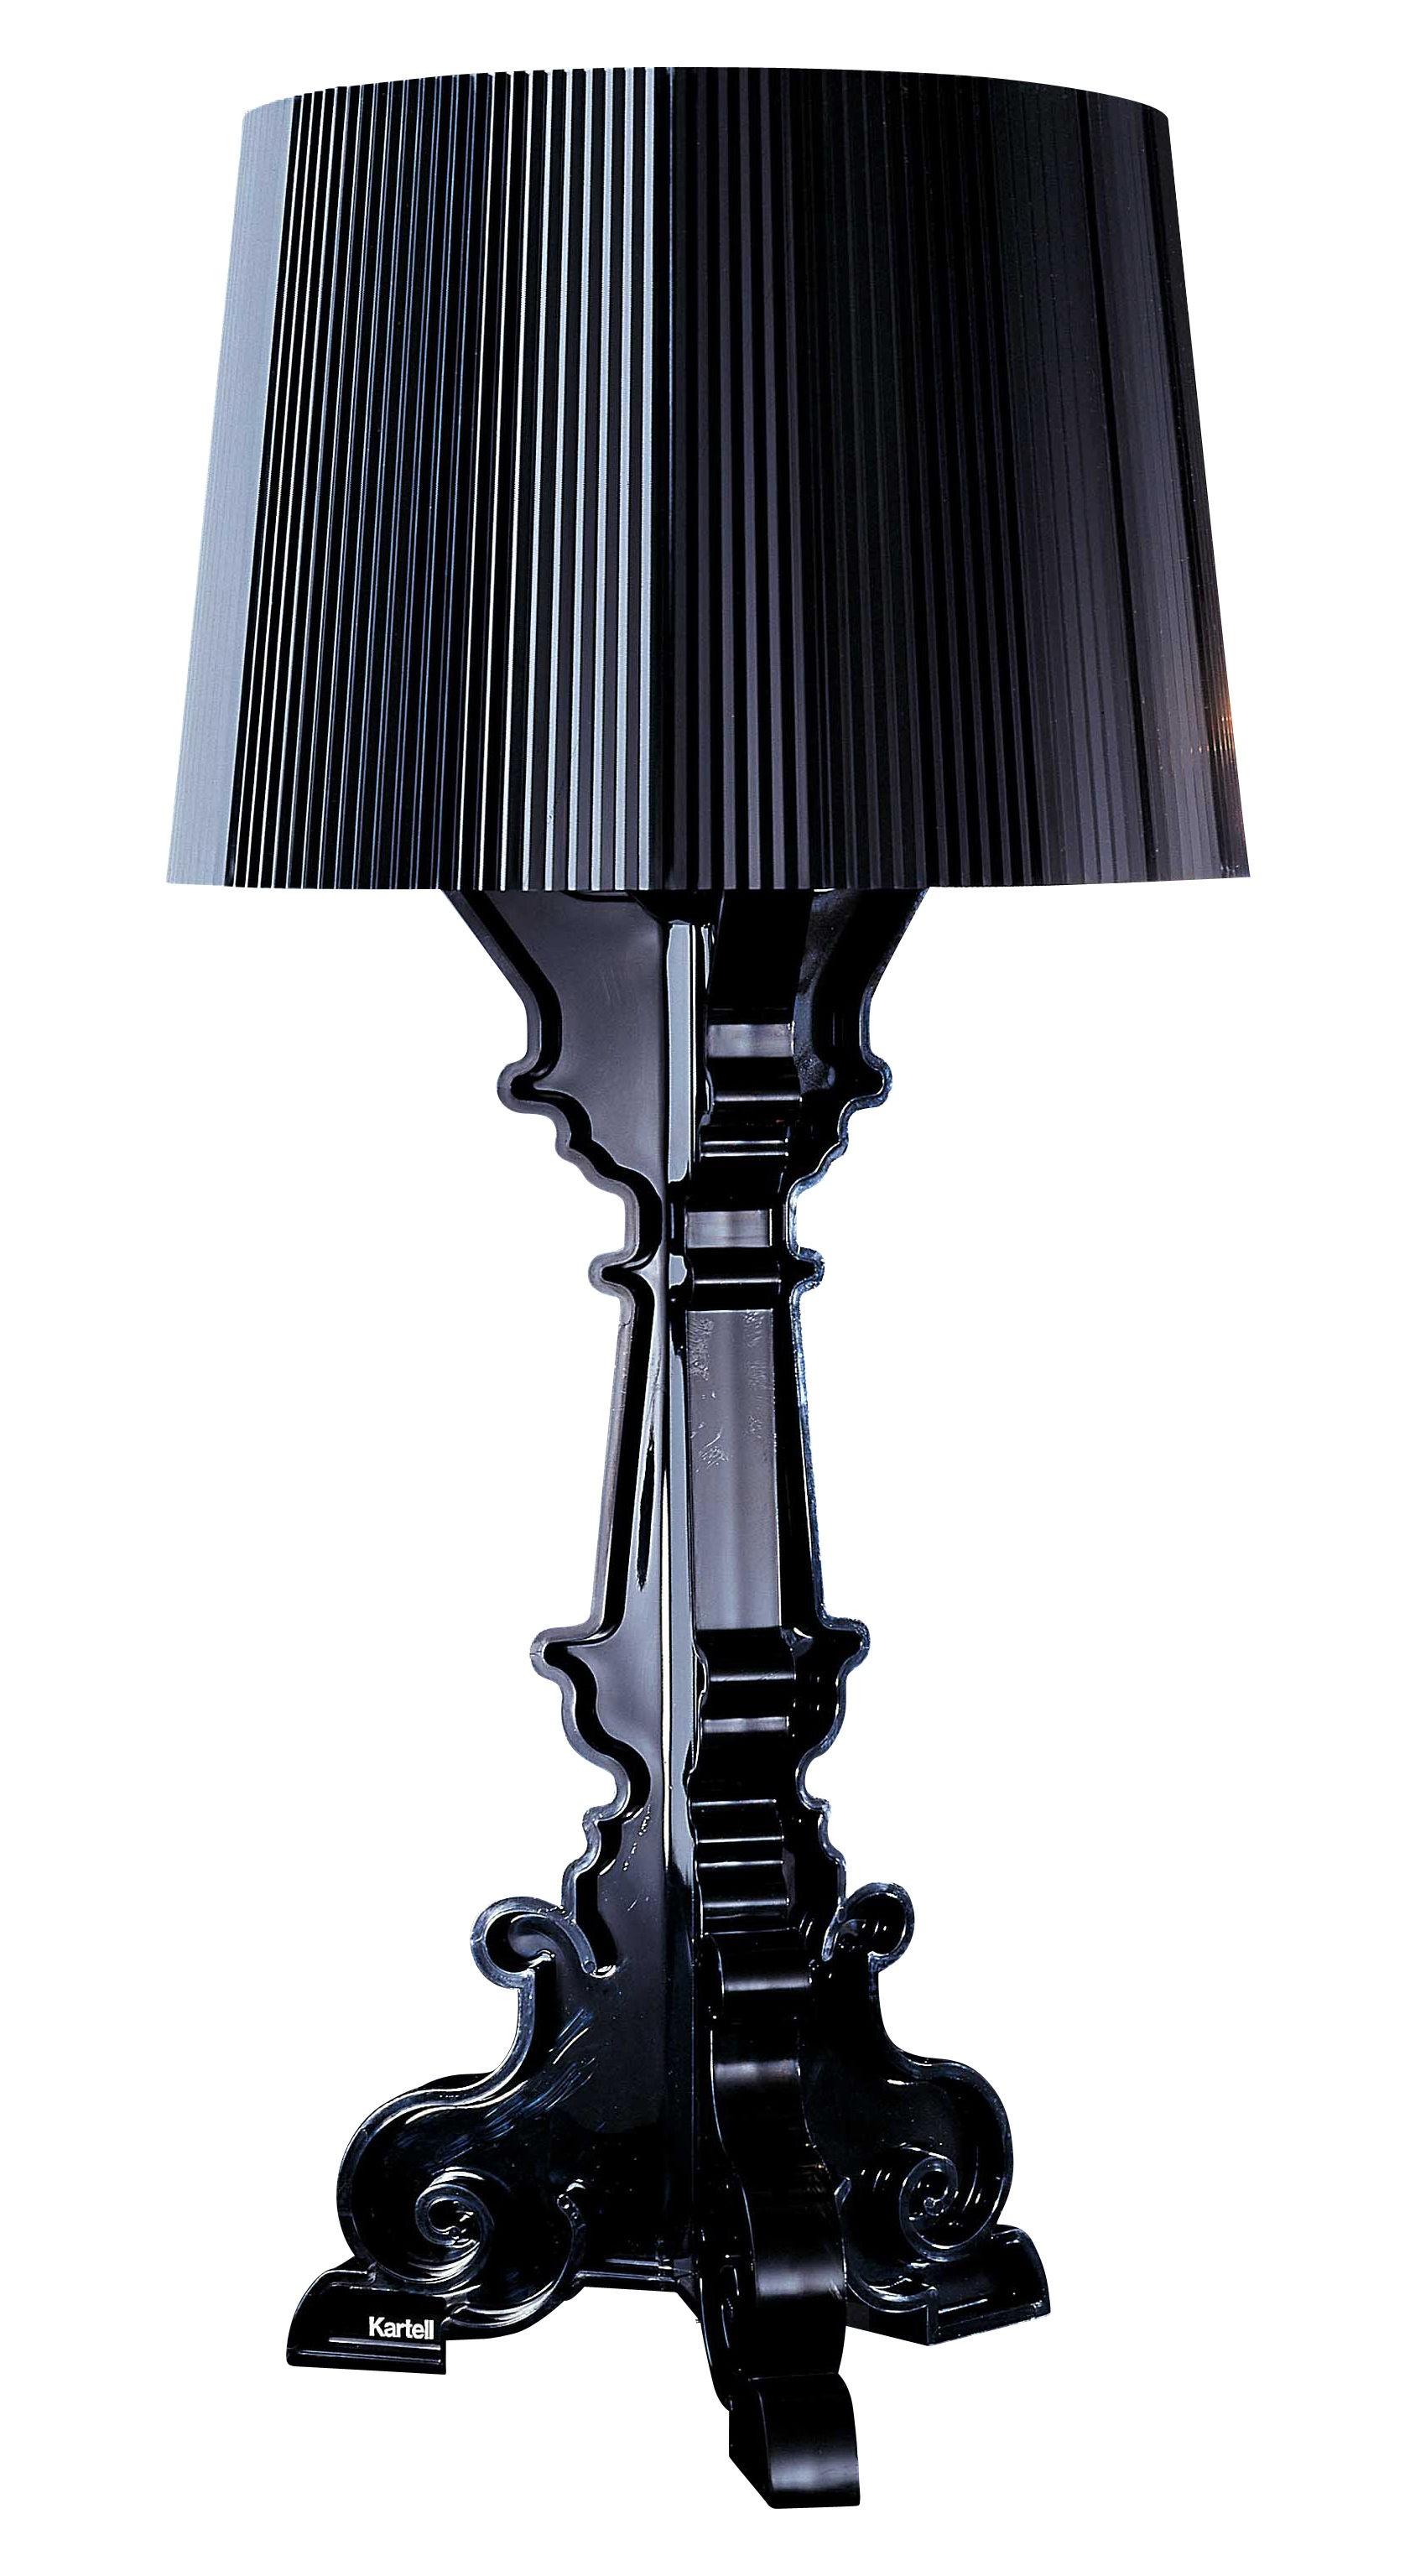 lampe bourgie de kartell 8 coloris. Black Bedroom Furniture Sets. Home Design Ideas